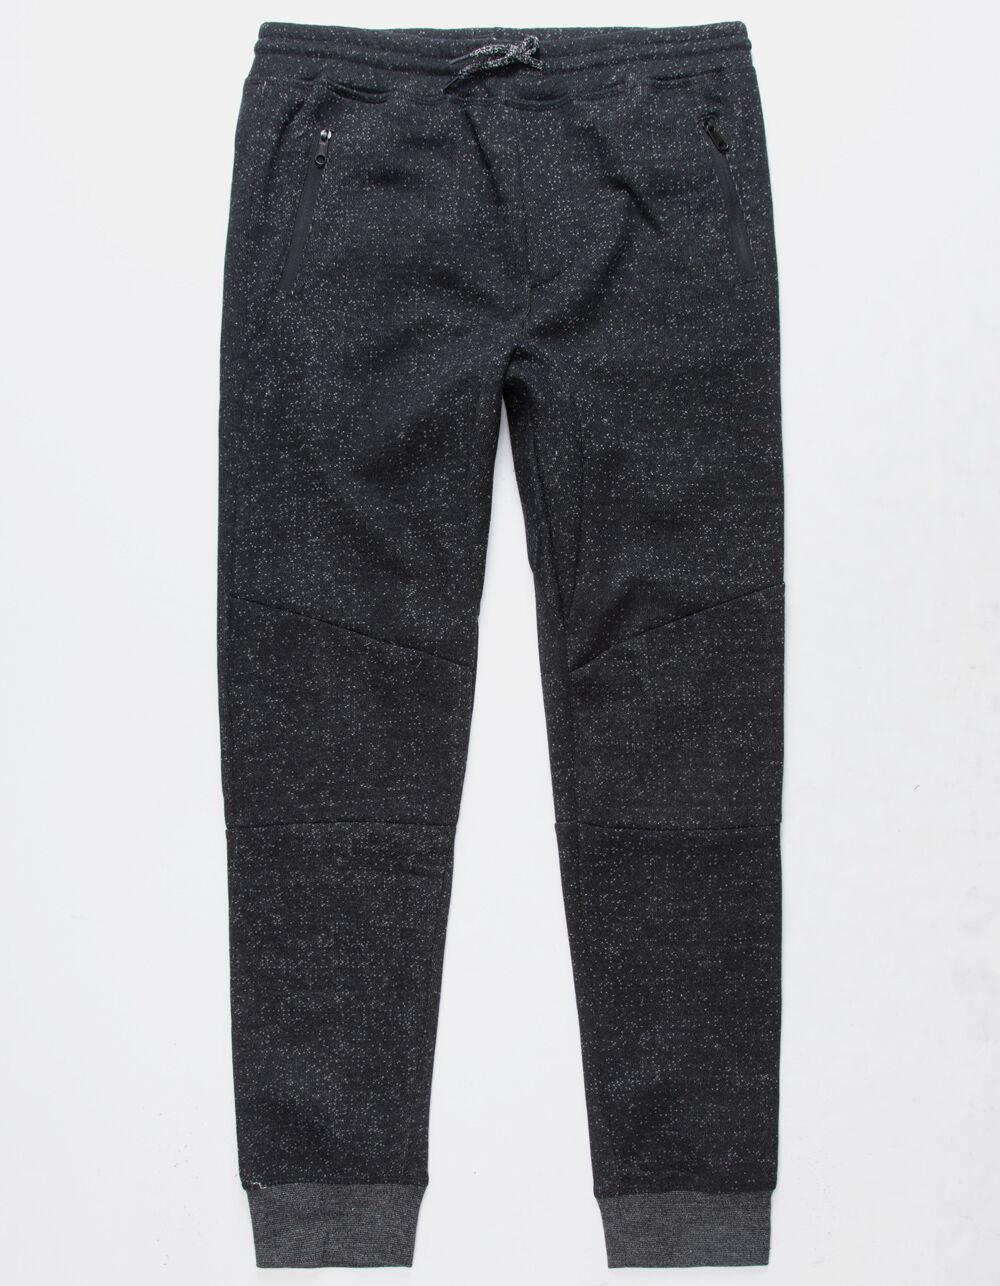 Image of BROOKLYN CLOTH MARLED ZIP BLACK BOYS JOGGER PANTS